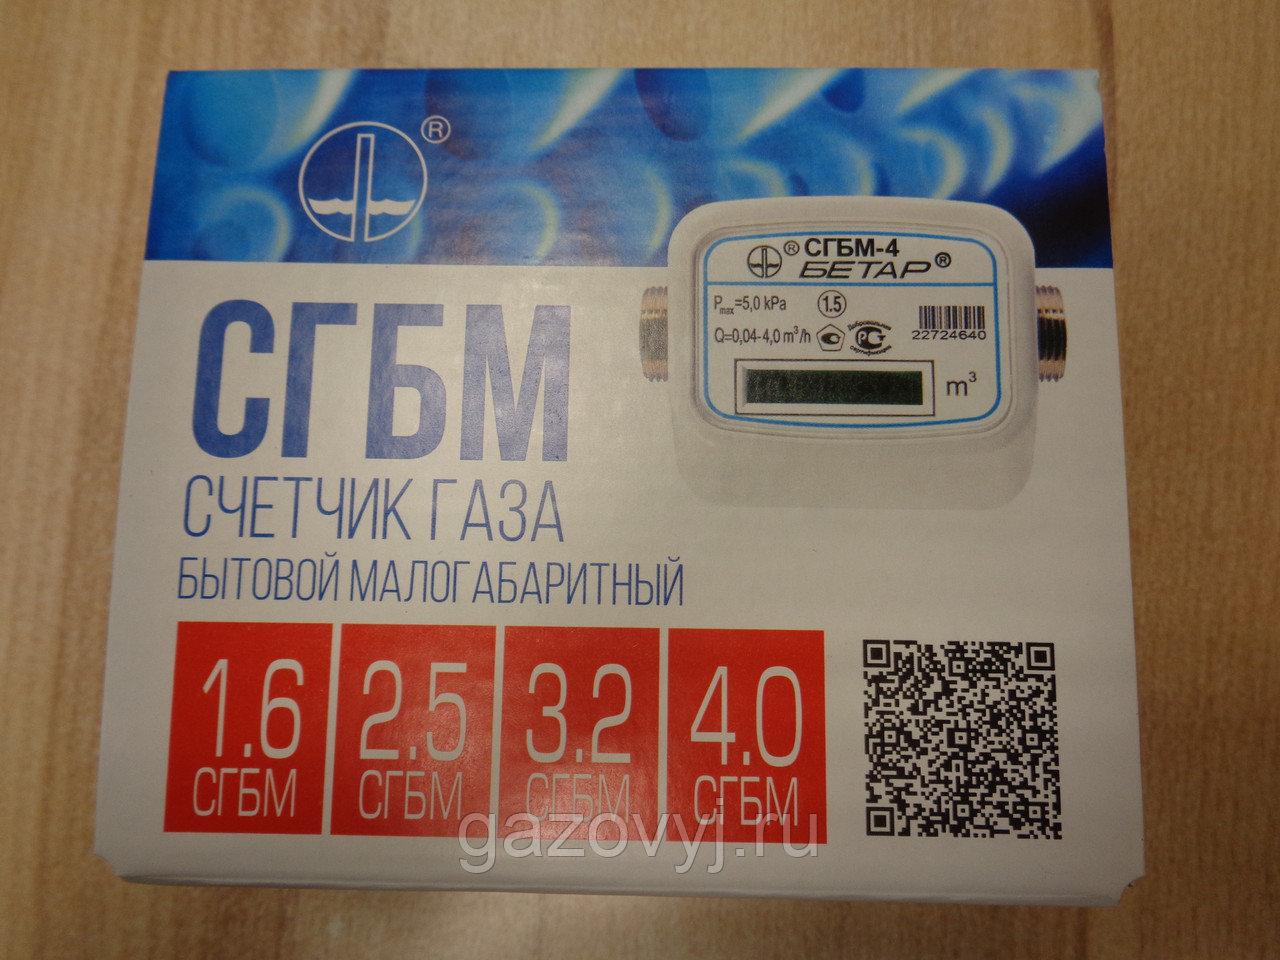 Газовый счетчик бетар сгбм 1 6: паспорт